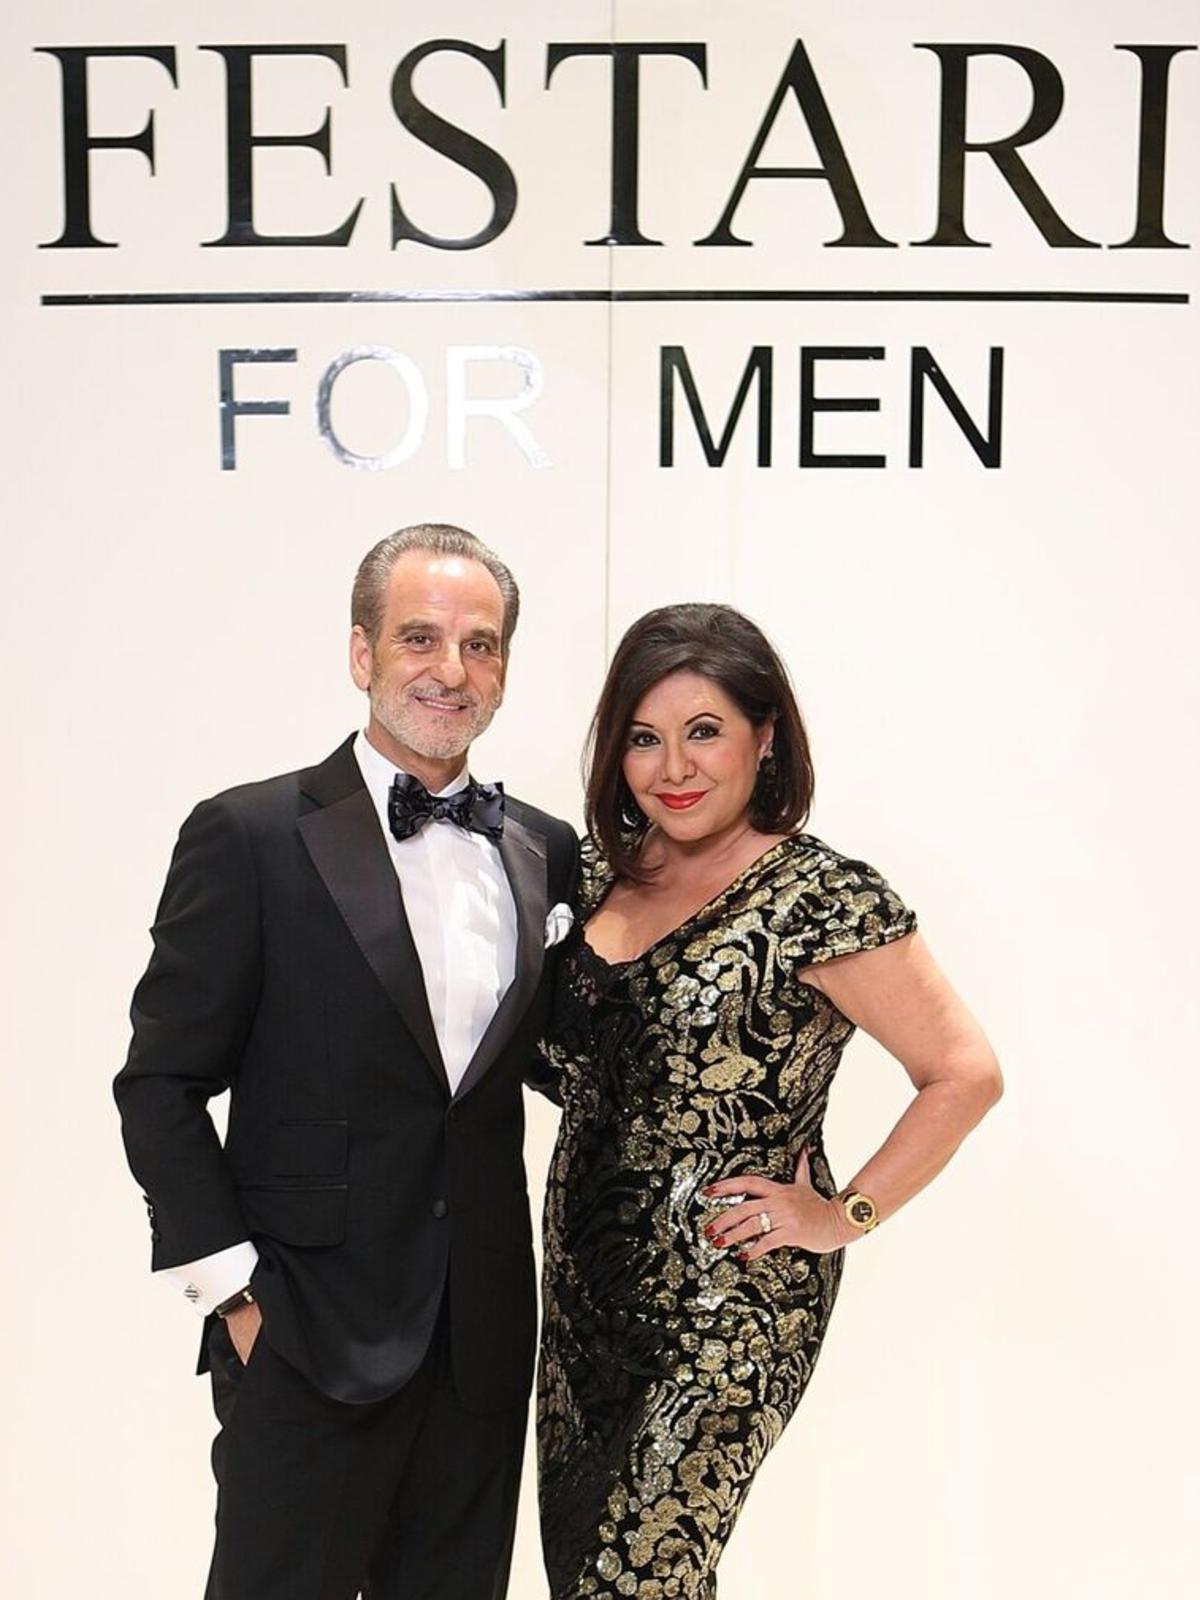 Una Notte-Rudy and Debbie Festari